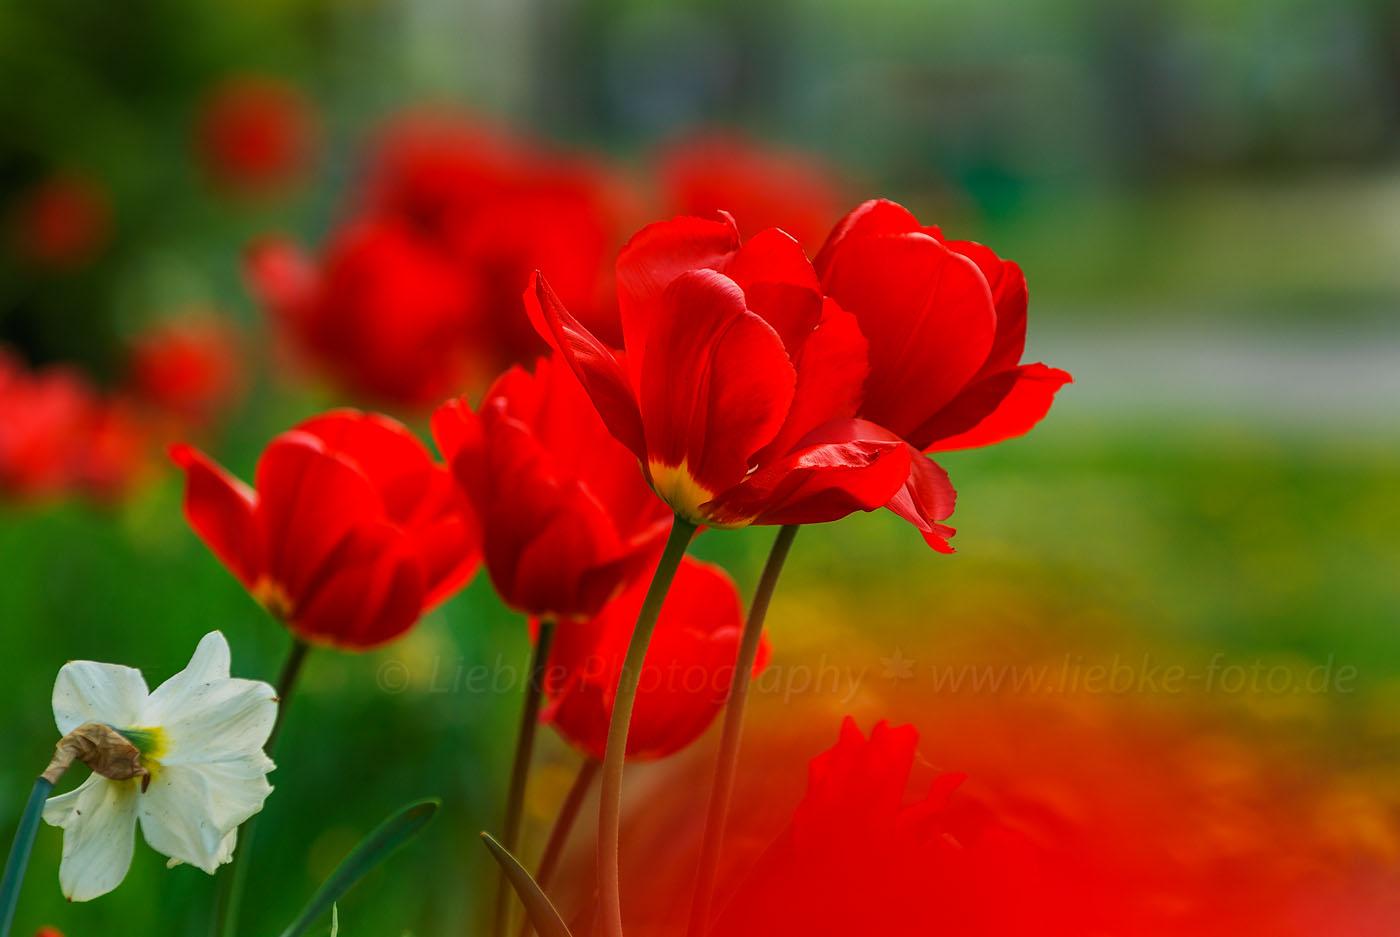 Tulpen und Frühling in Oberhavel